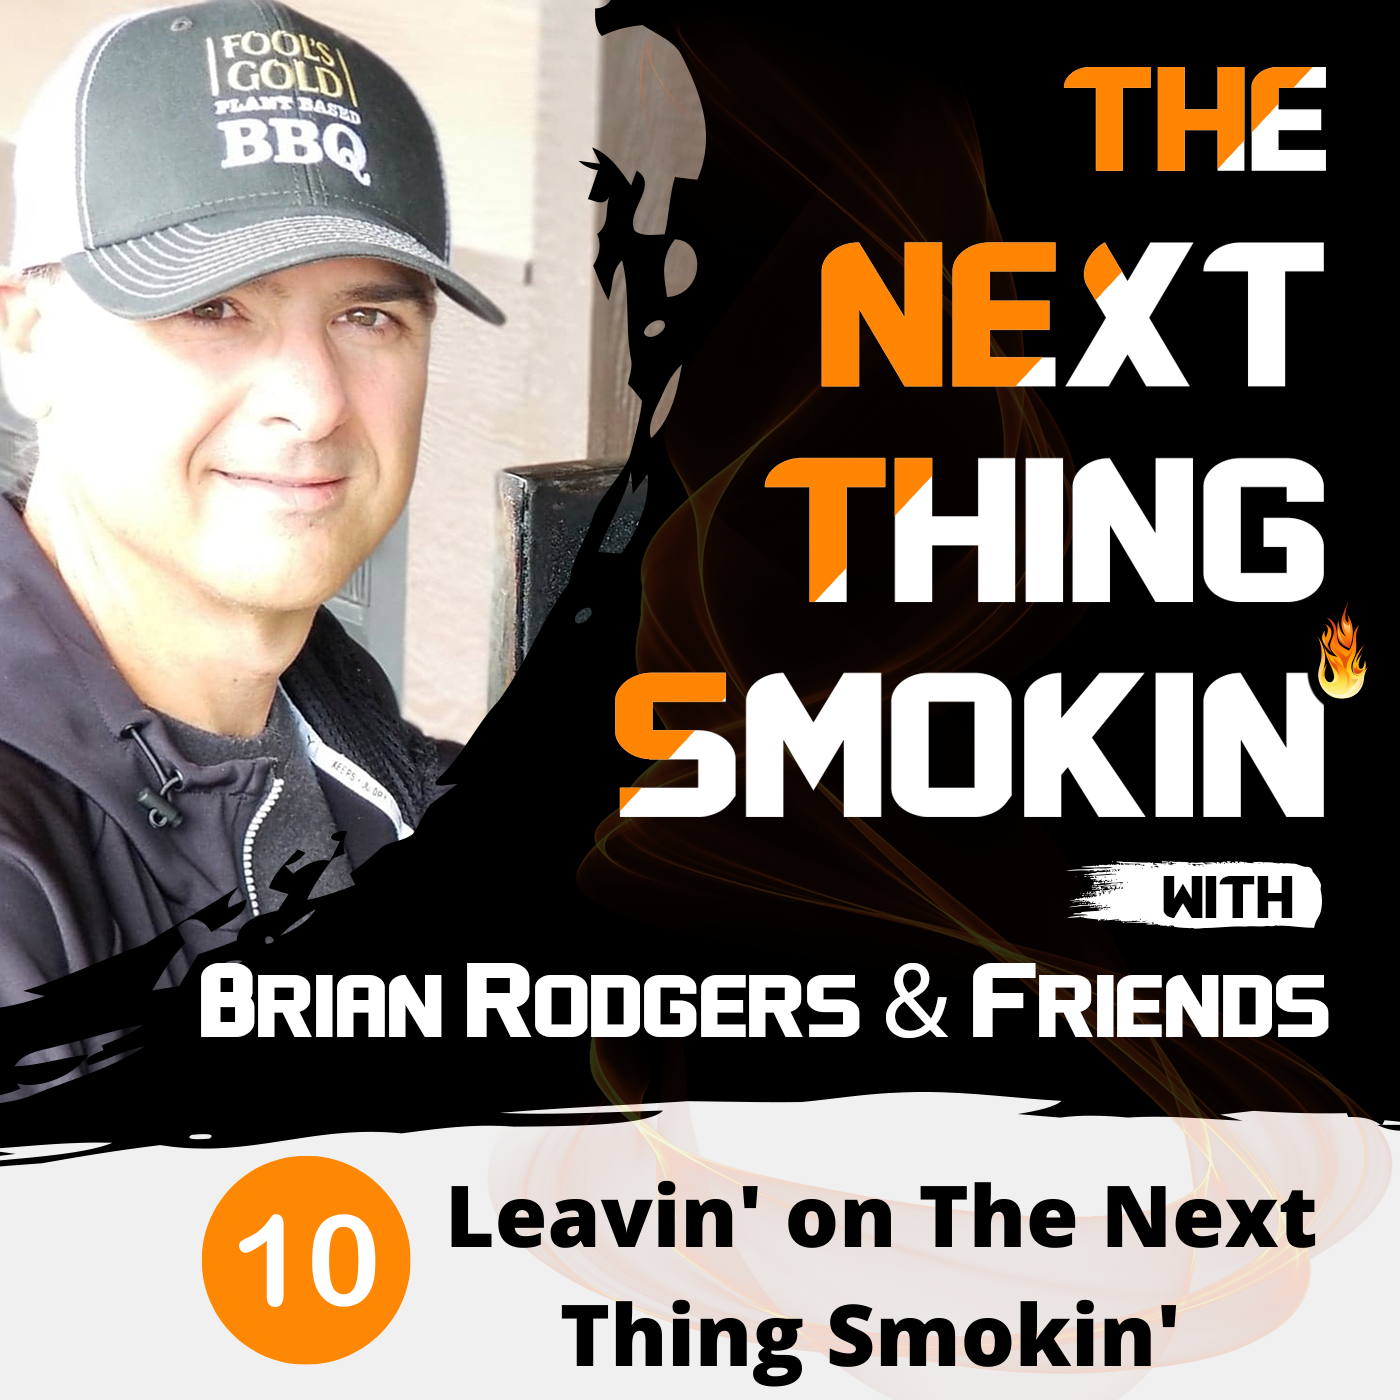 Leavin' on The Next Thing Smokin'